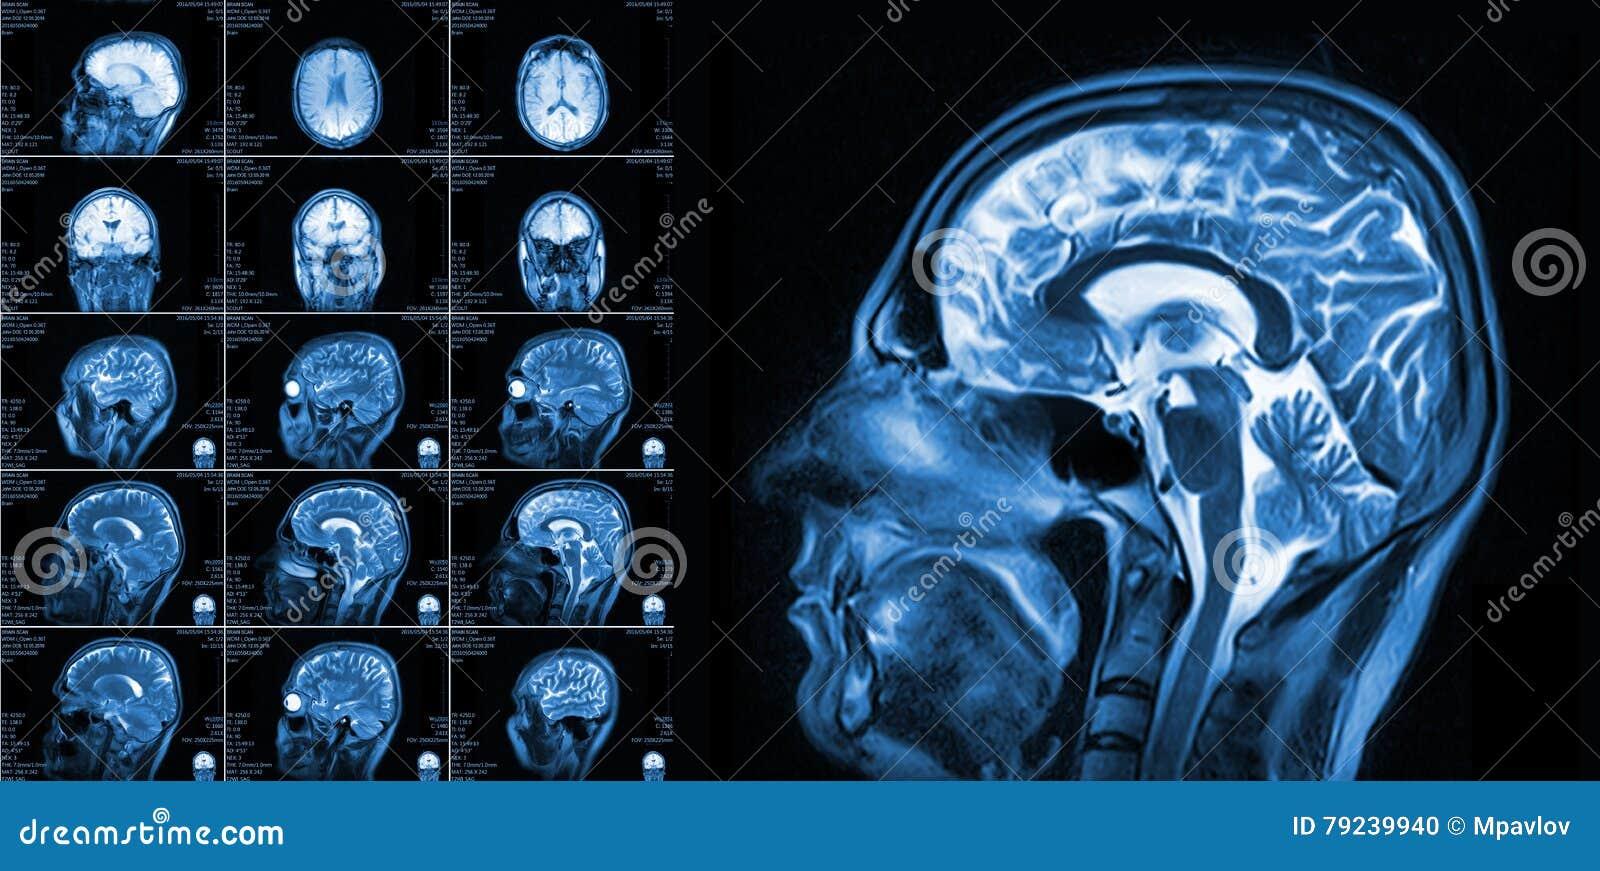 Magnetic Resonance Imaging Of The Brain Stock Photo - Image of human ...